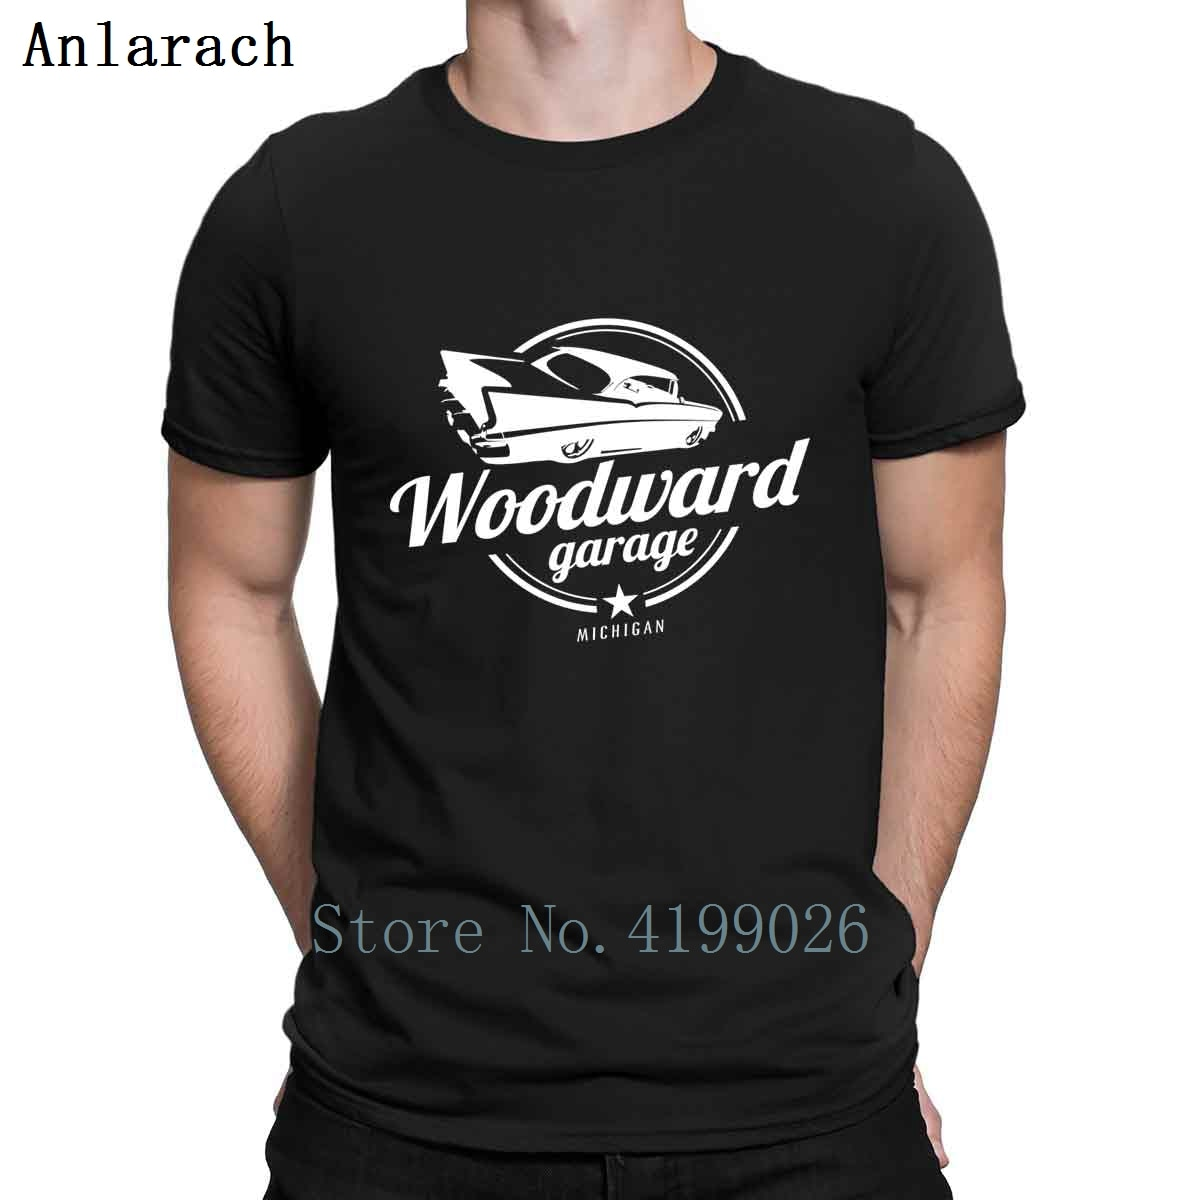 Woodward Cruise 6 camiseta Detroit traje estampado de talla grande 2018 camiseta de moda para hombre tapas divertidas camiseta para hombre